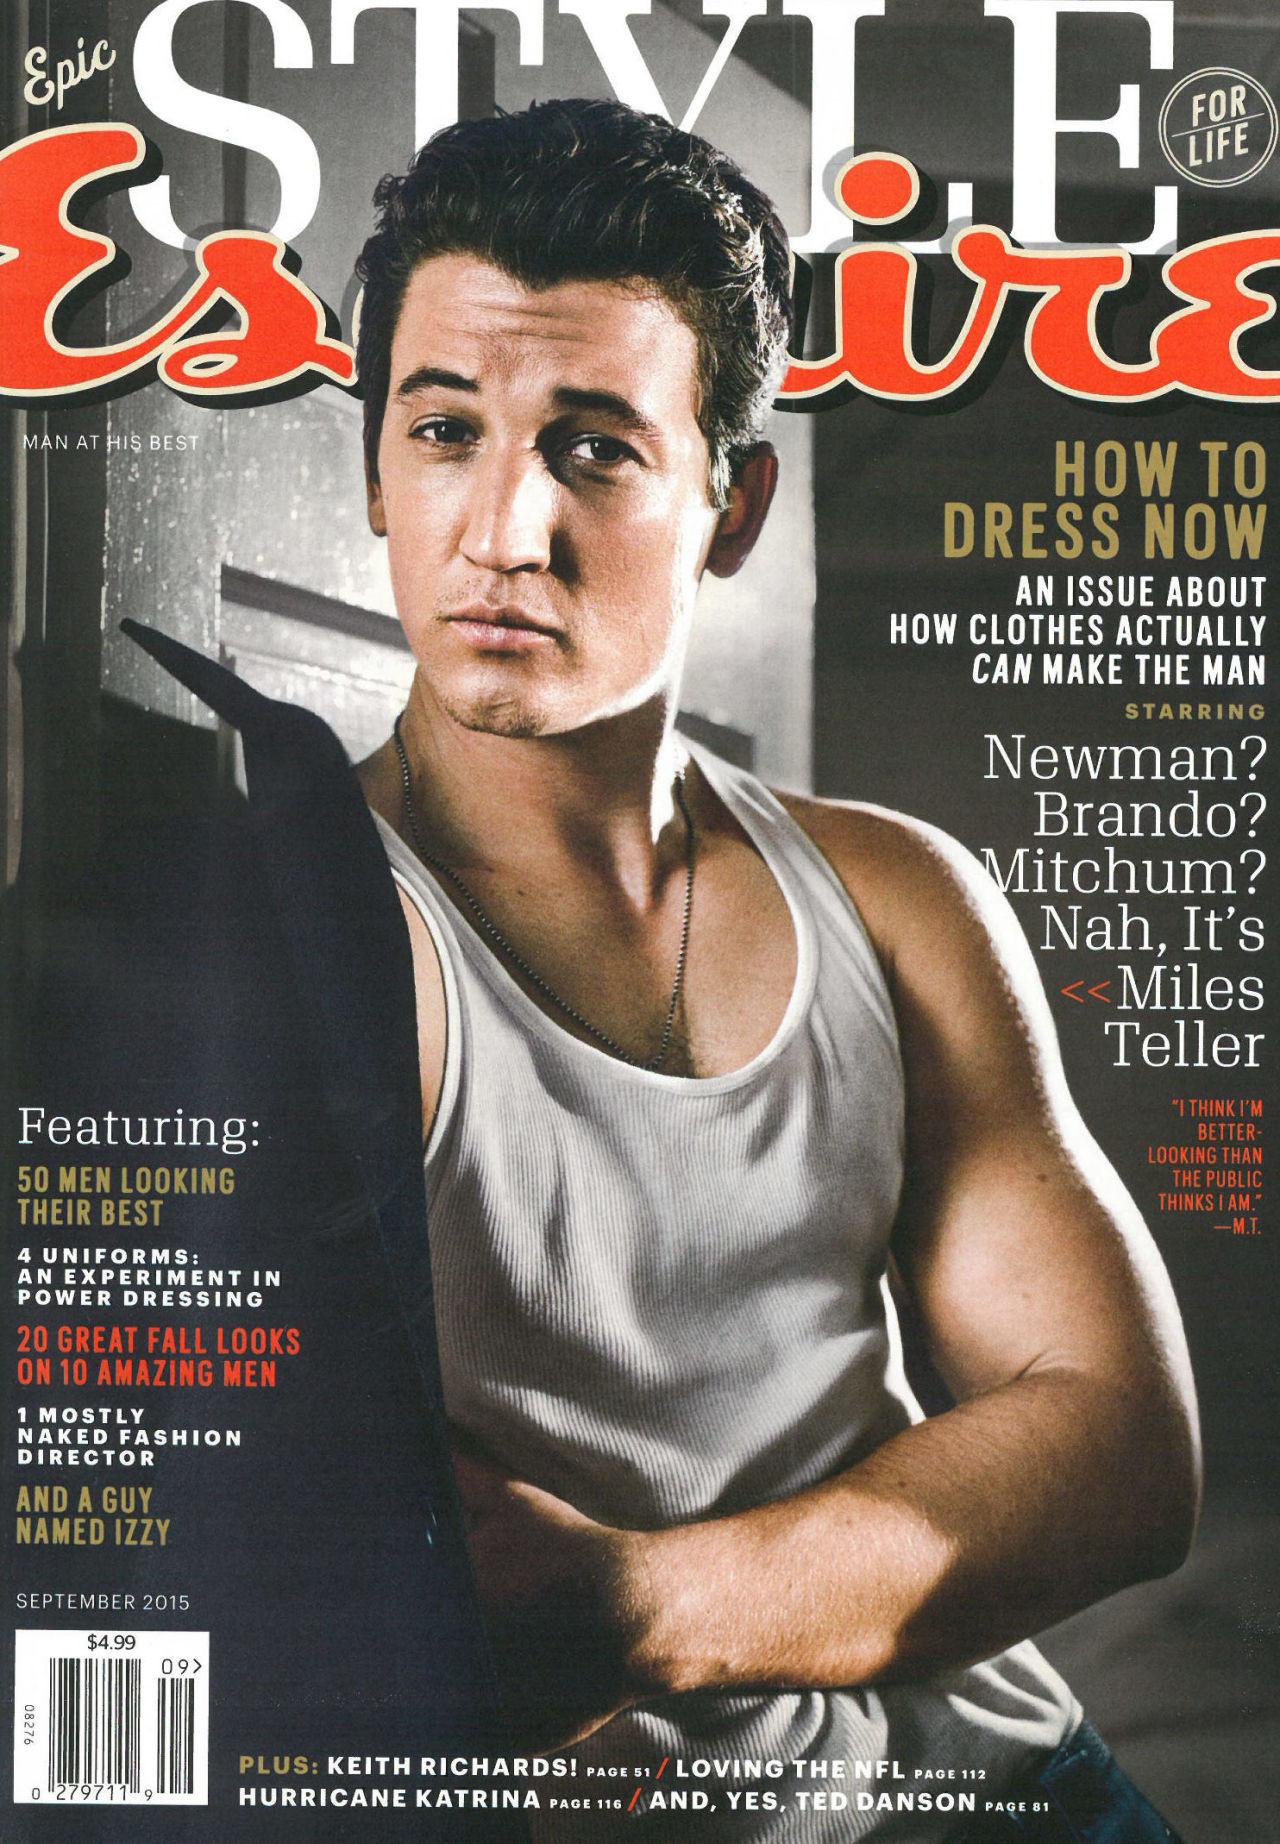 Miles Teller Covers September 2015 Esquire